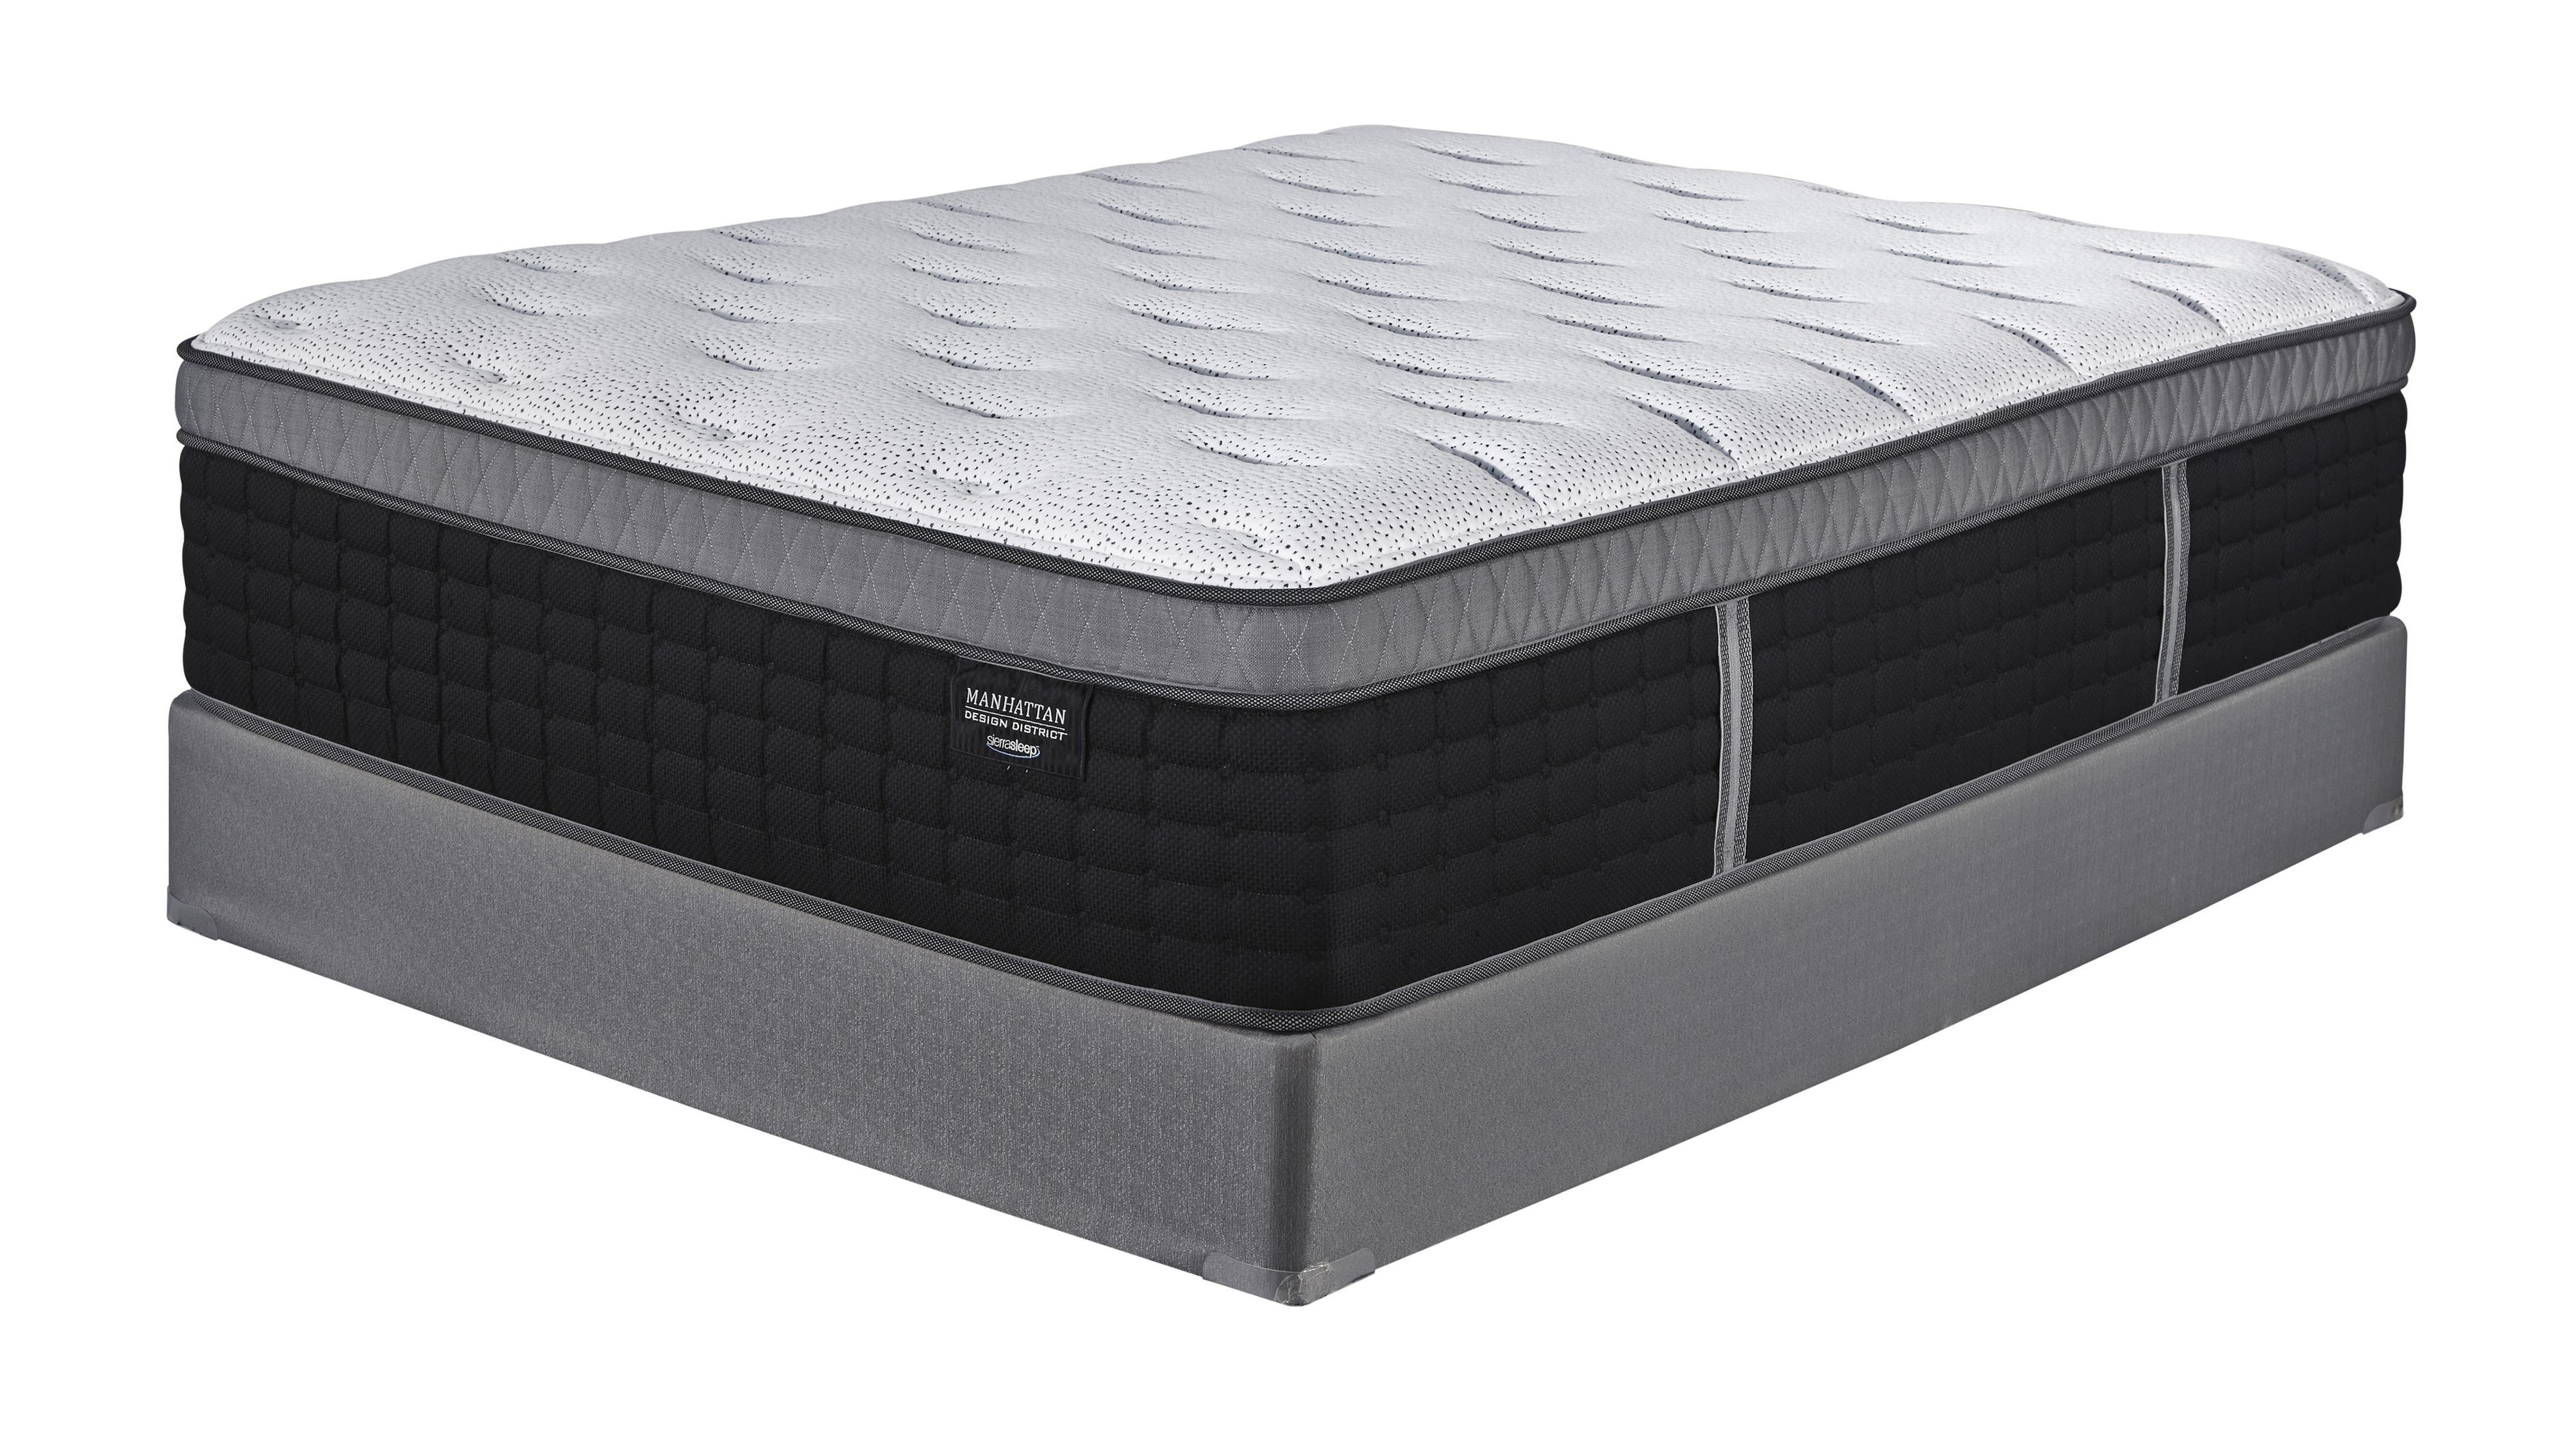 Sierra Sleep Manhattan Design King Plush Hybrid Mattress Set - Item Number: M97741+2xM81X42